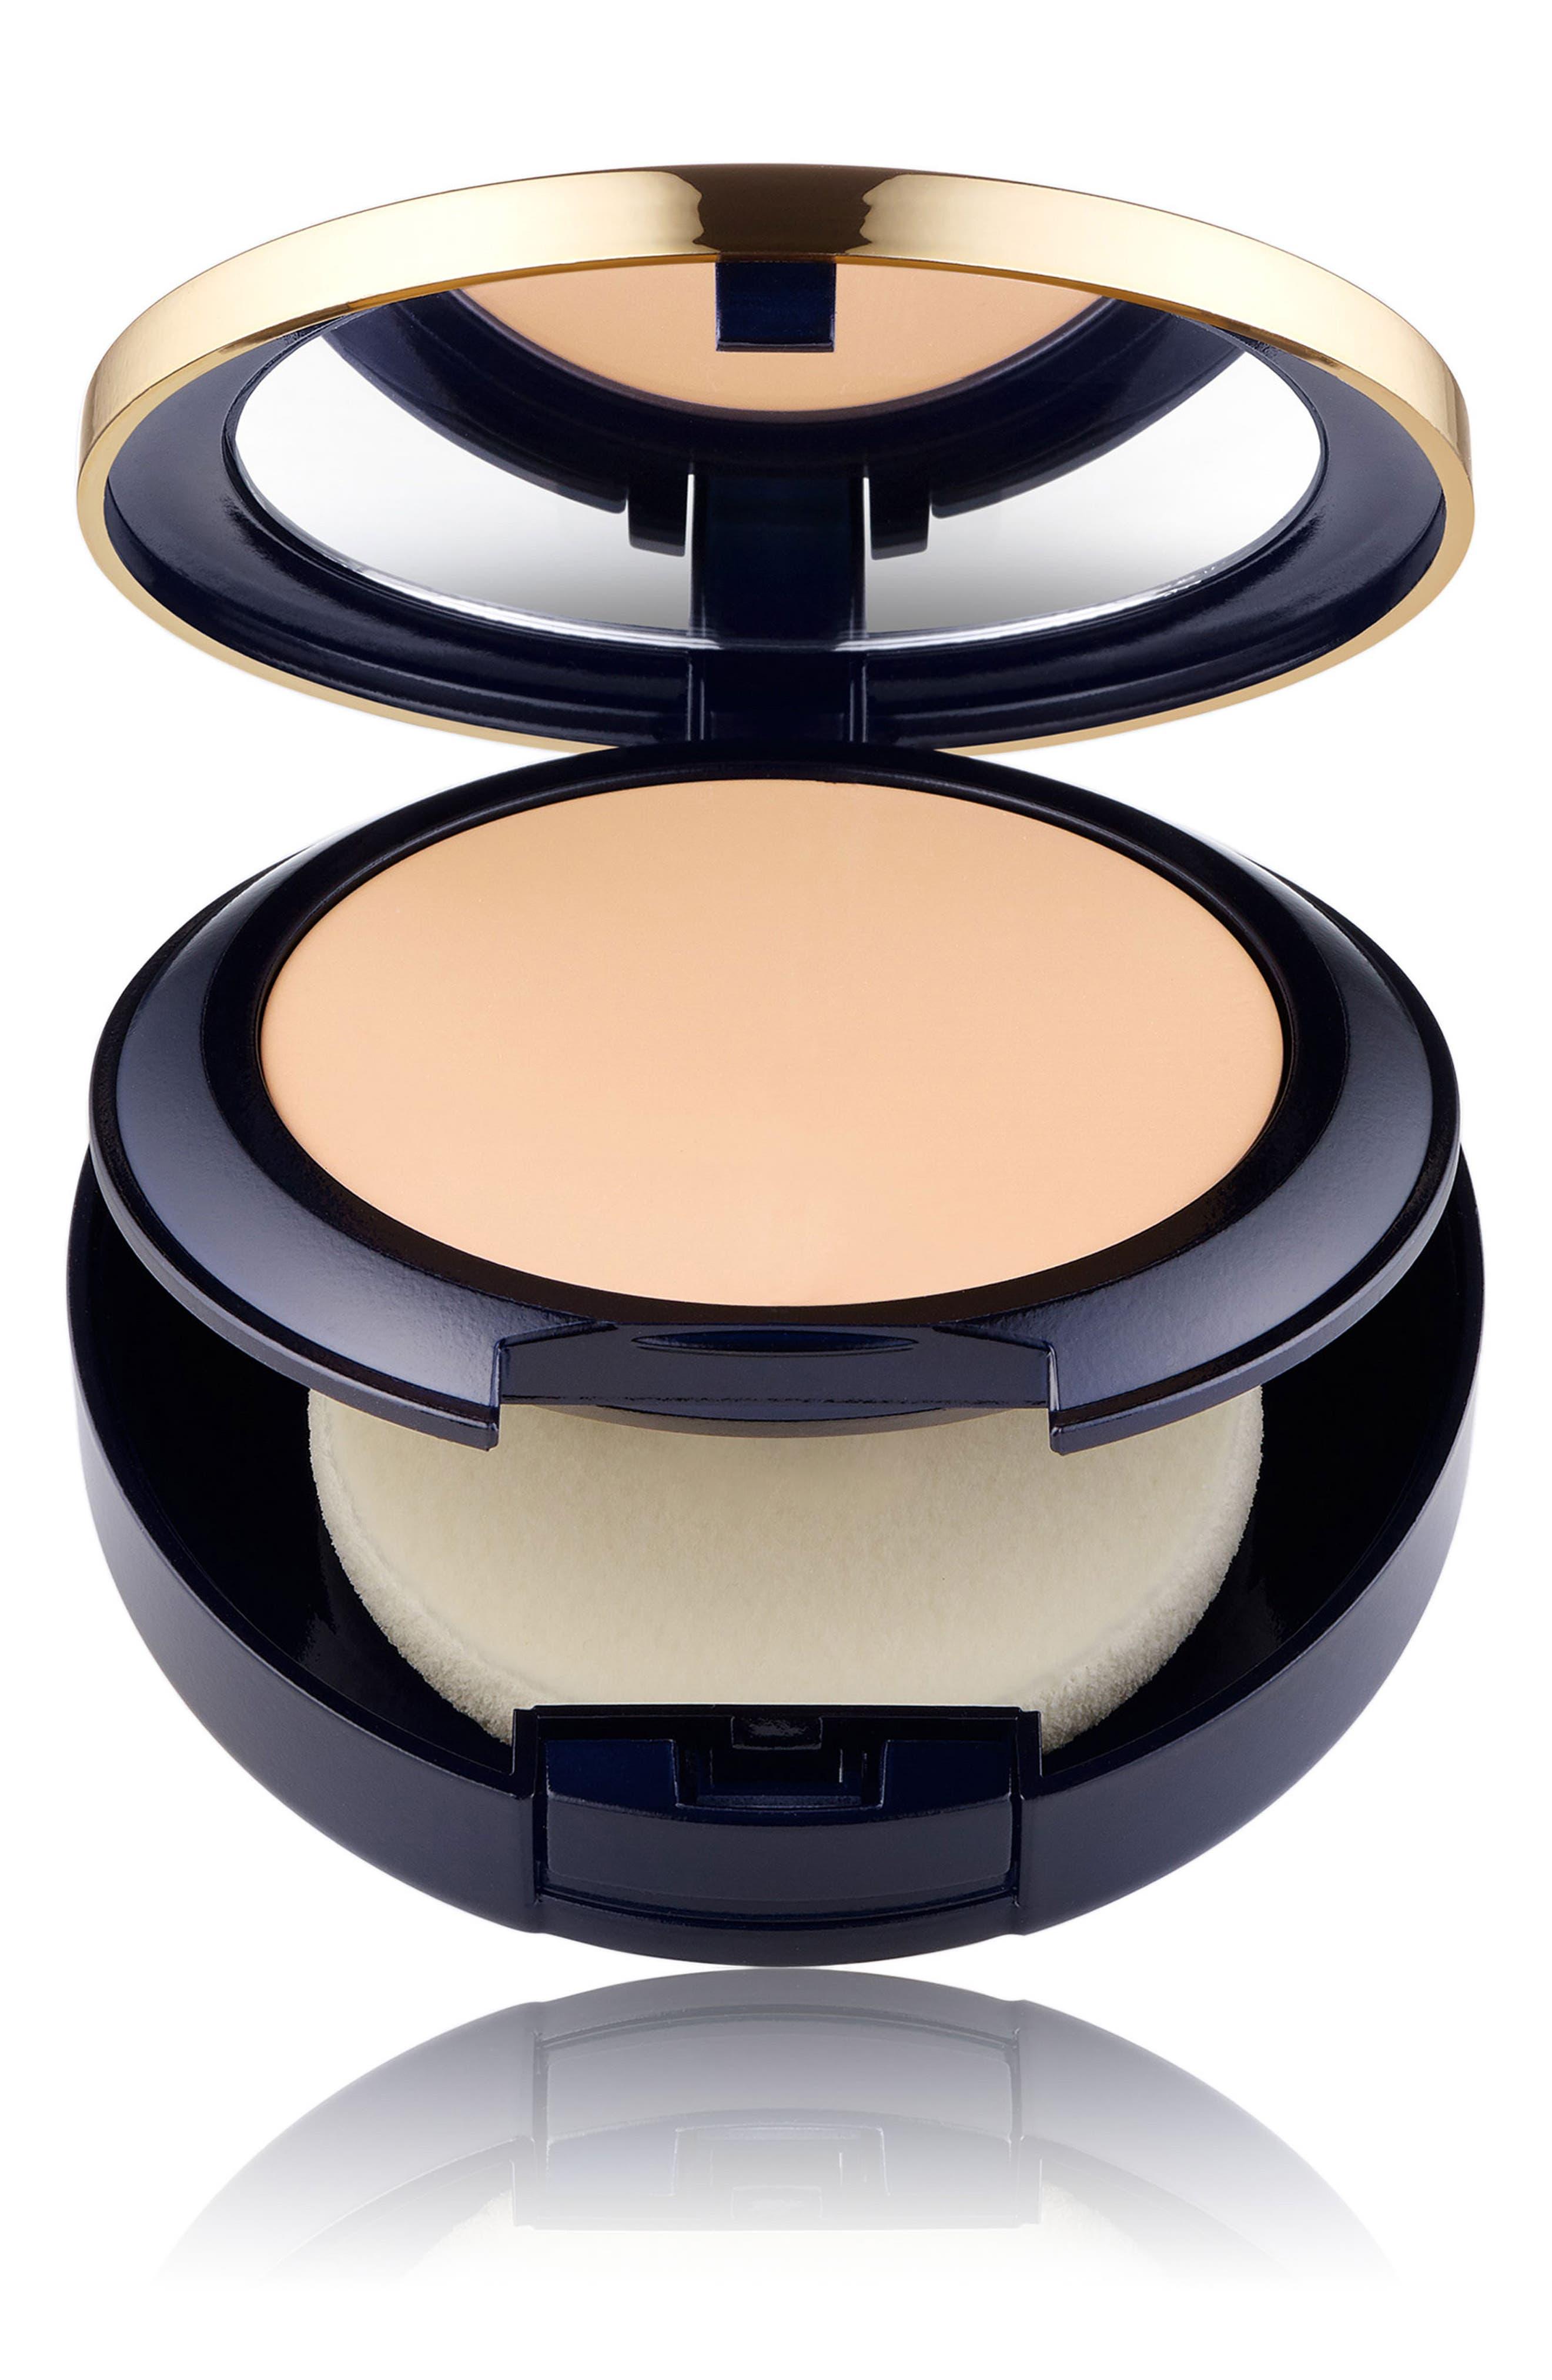 Estee Lauder Double Wear Stay In Place Matte Powder Foundation - 3C2 Pebble